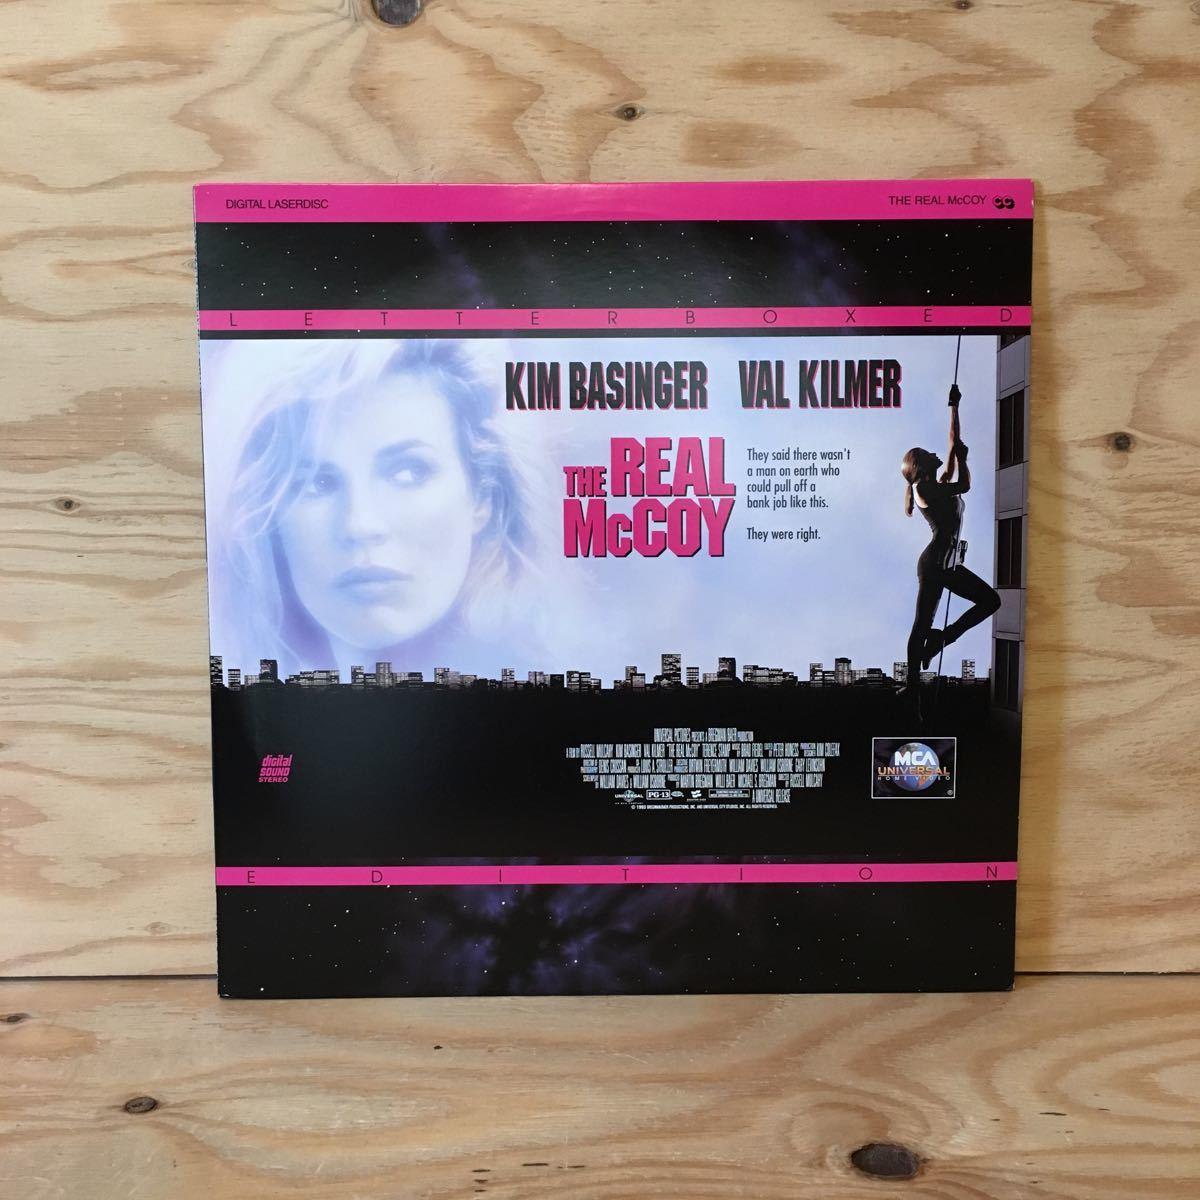 ◎3FJJD-200218 レア[THE REAL McCOY]LD レーザーディスク KIM BASINGER RUSSELL MULCAHY_画像1